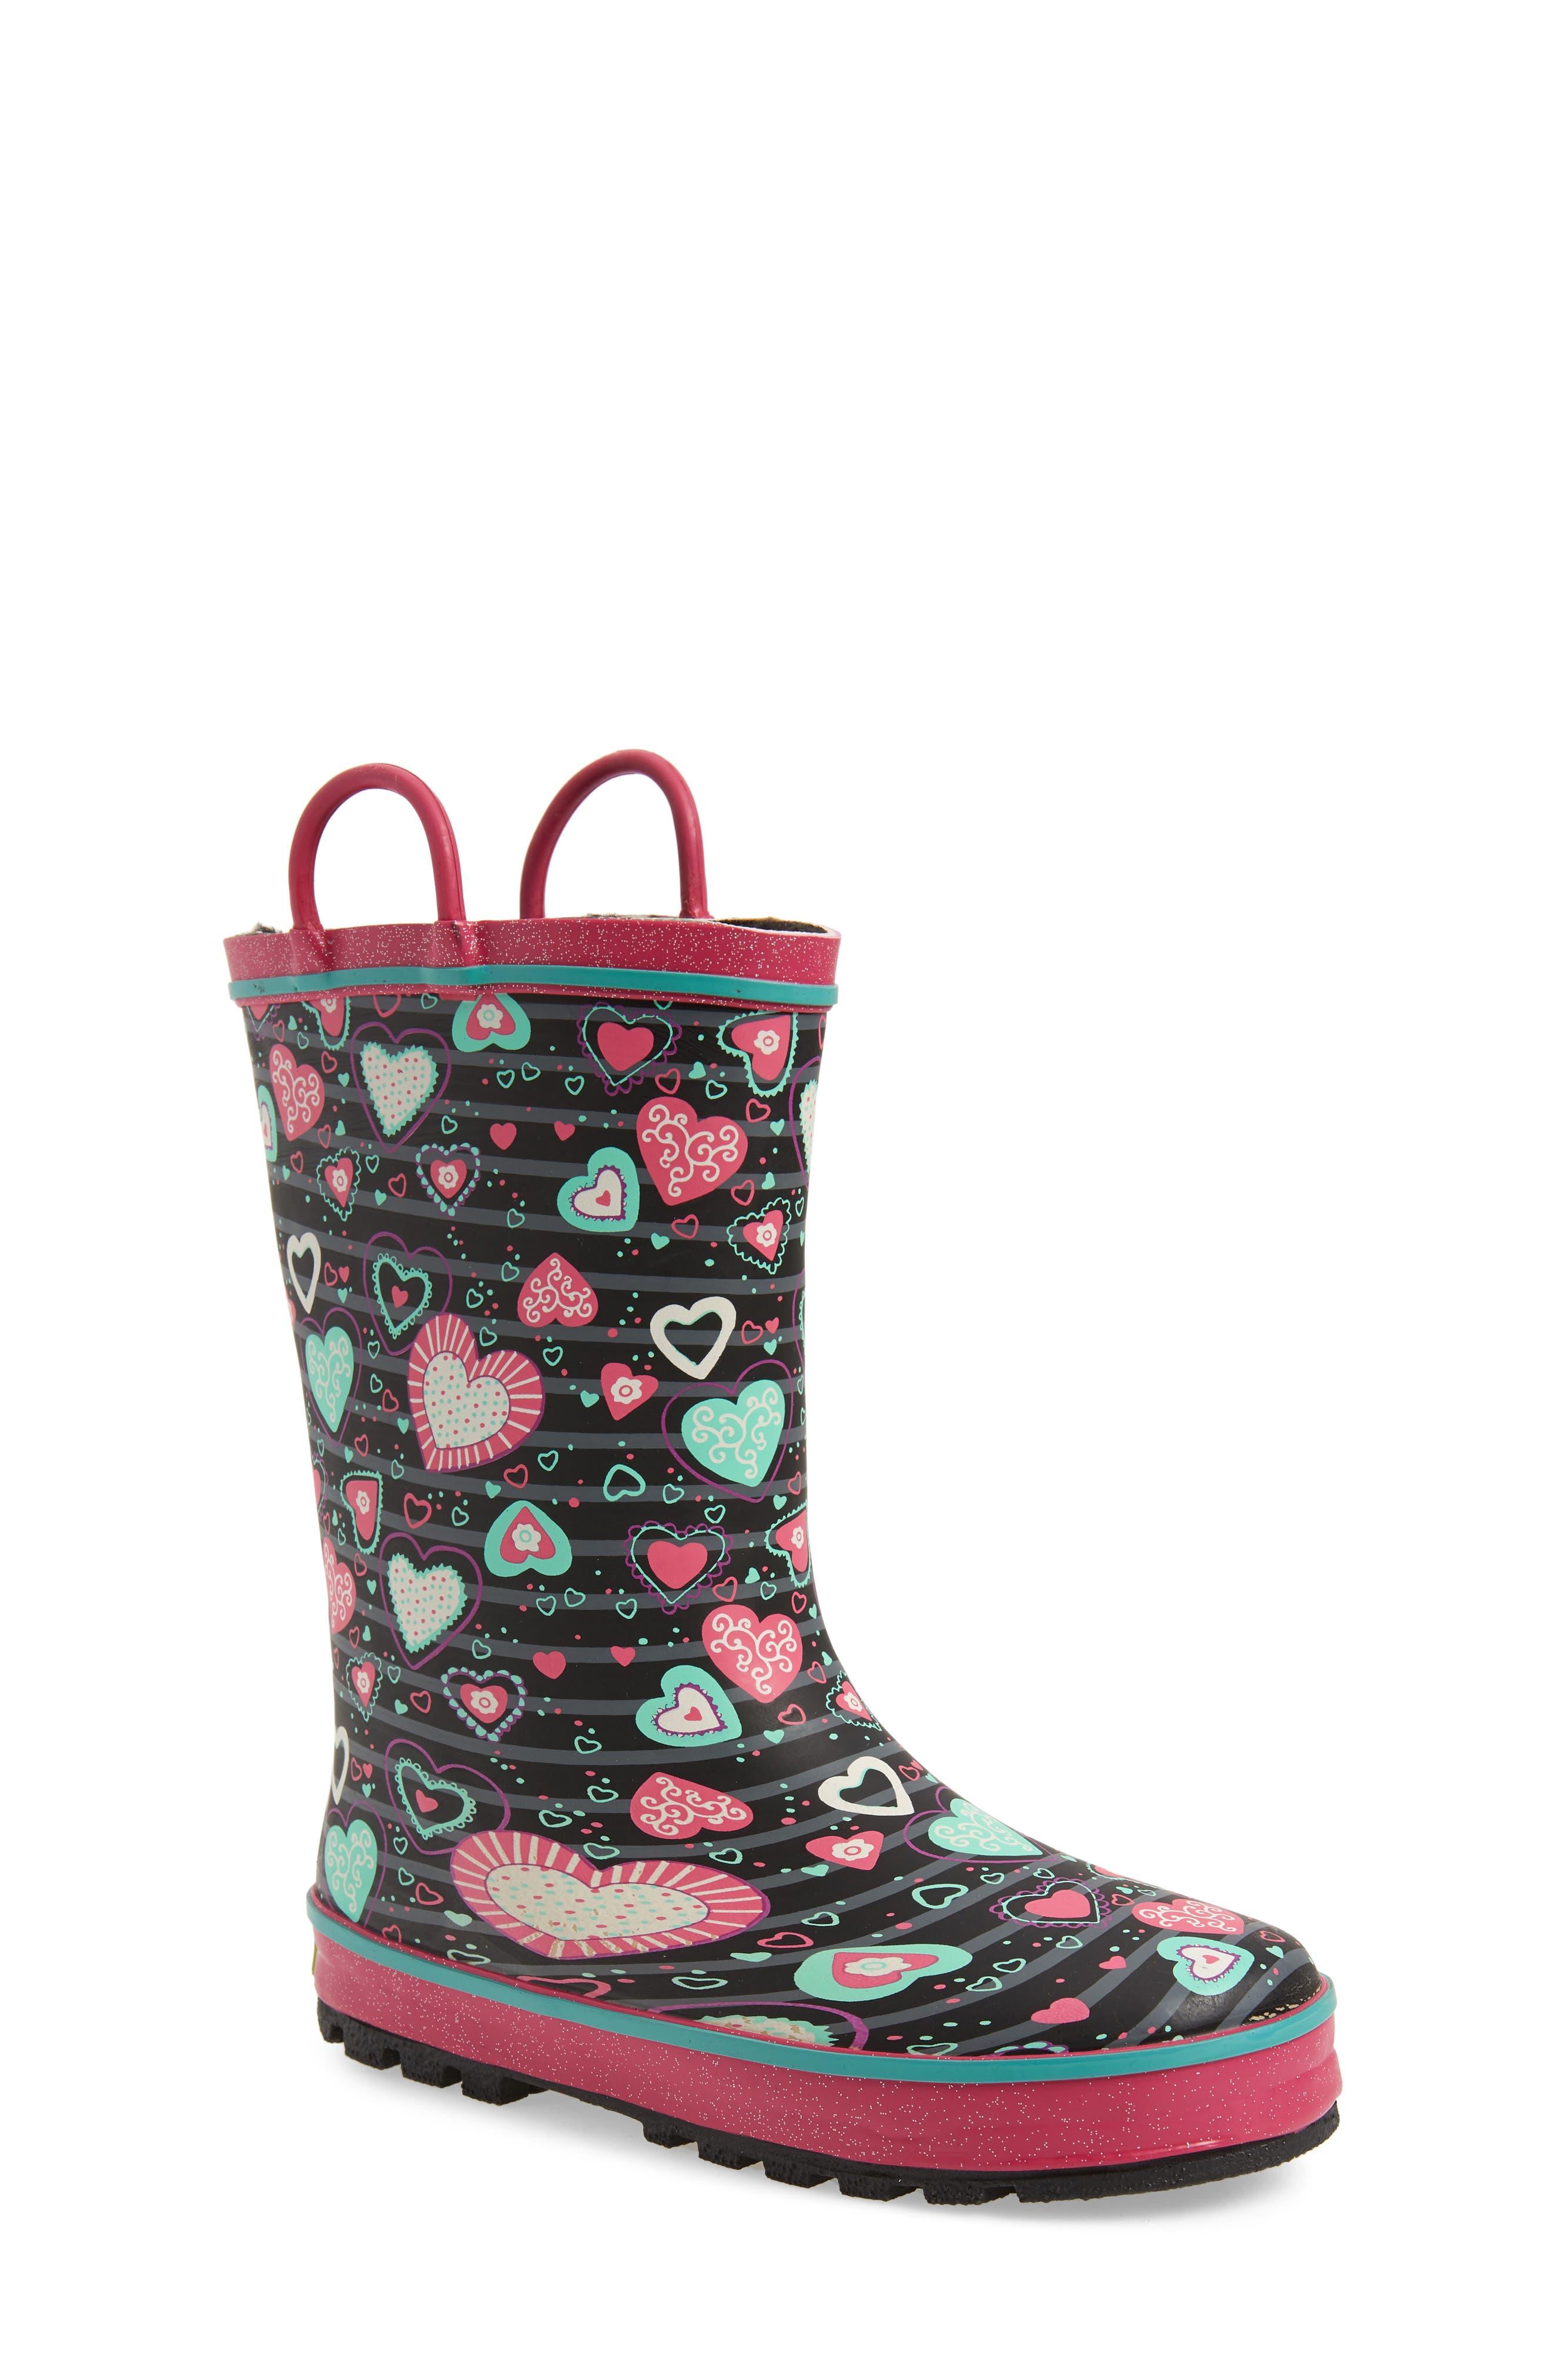 Neon Hearts Glitter Trim Waterproof Rain Boot,                             Main thumbnail 1, color,                             MULTI